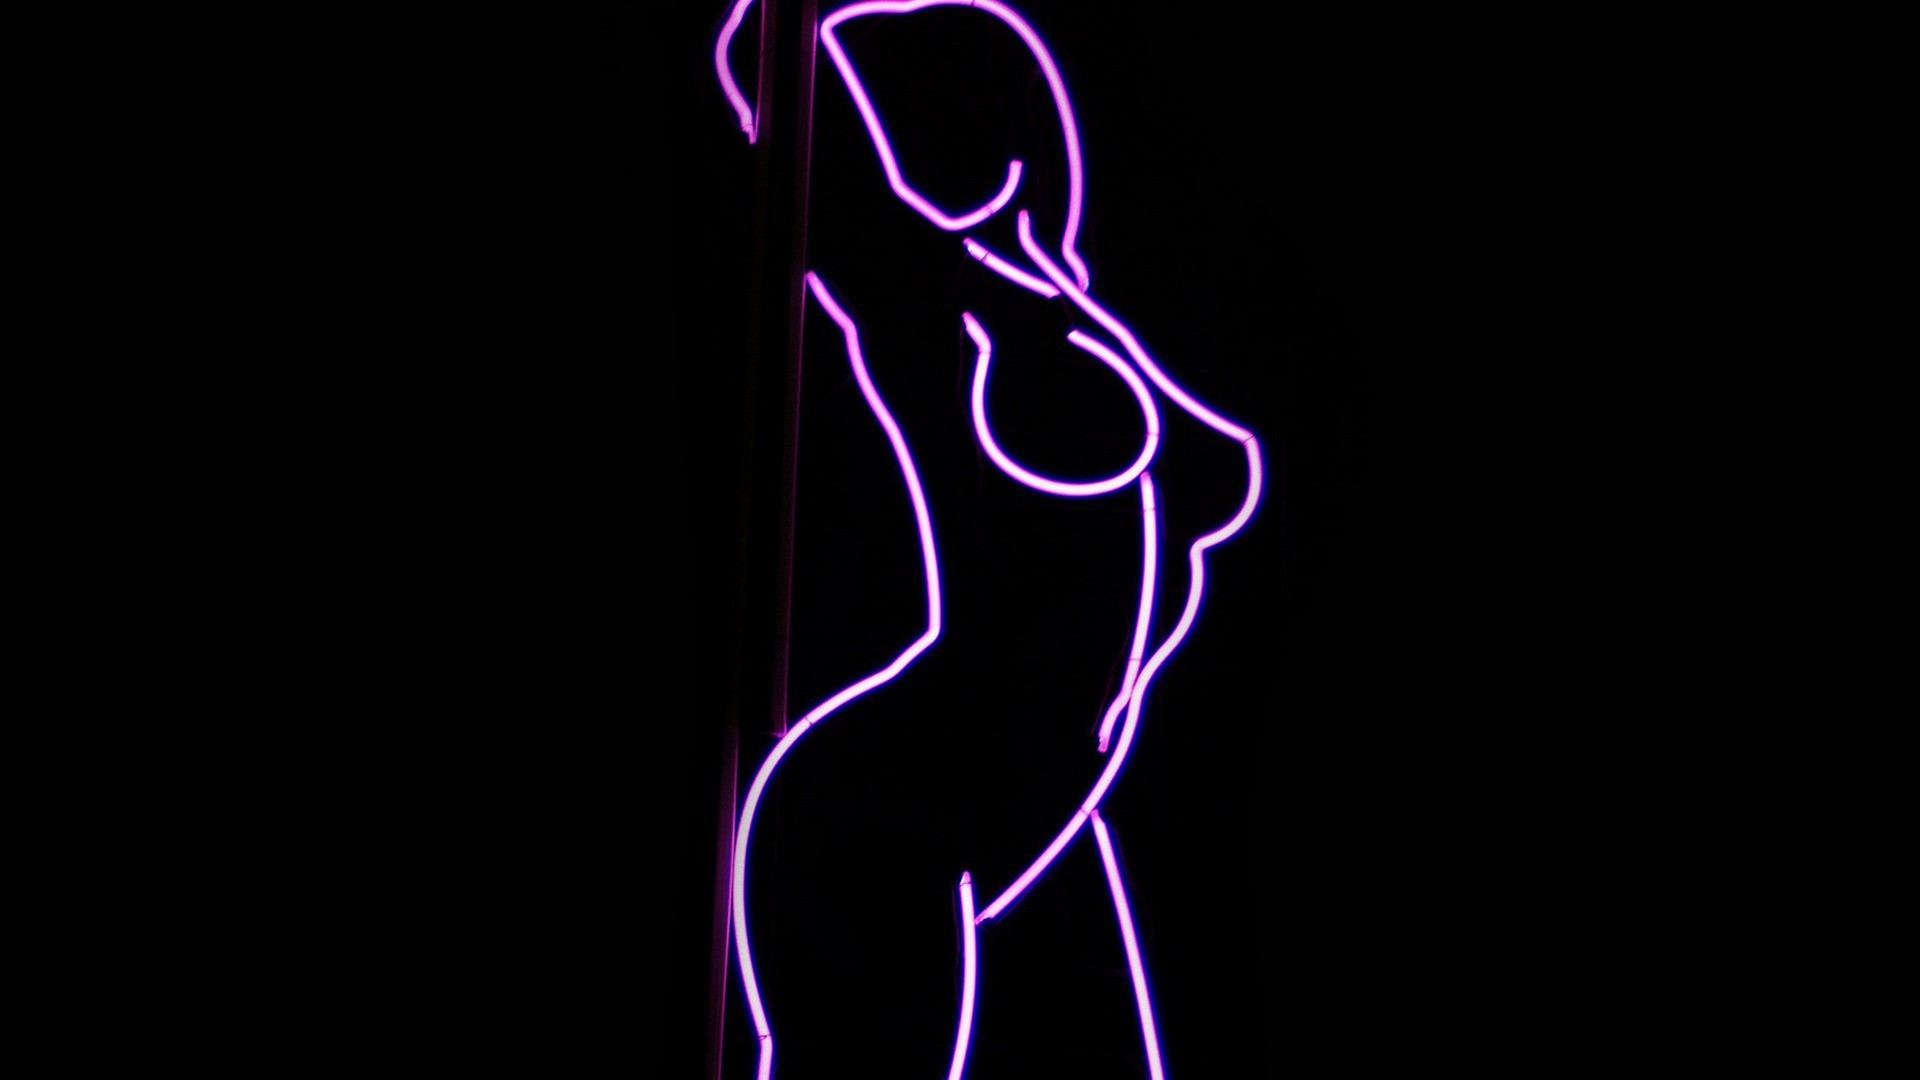 Neon light porn pics